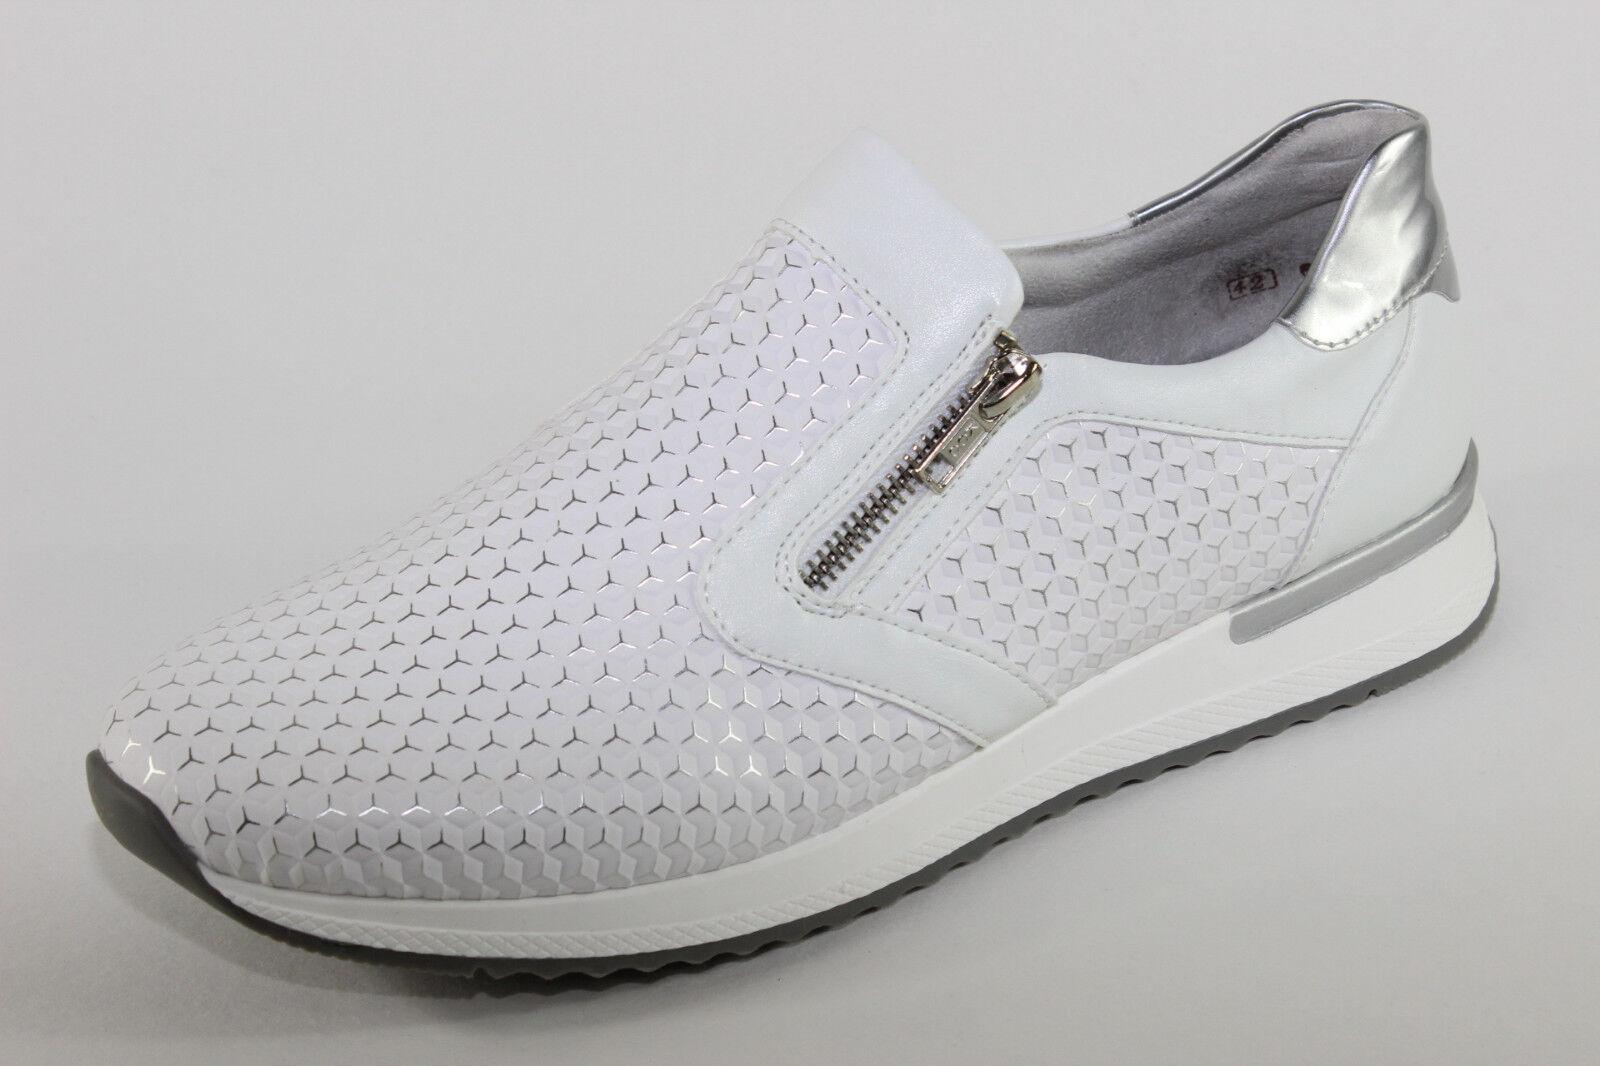 Remonte R7012-80, Sneaker Damenschuhe mit Reißverschluss, 3-D Look, Damenschuhe Sneaker Übergröße 1c289b